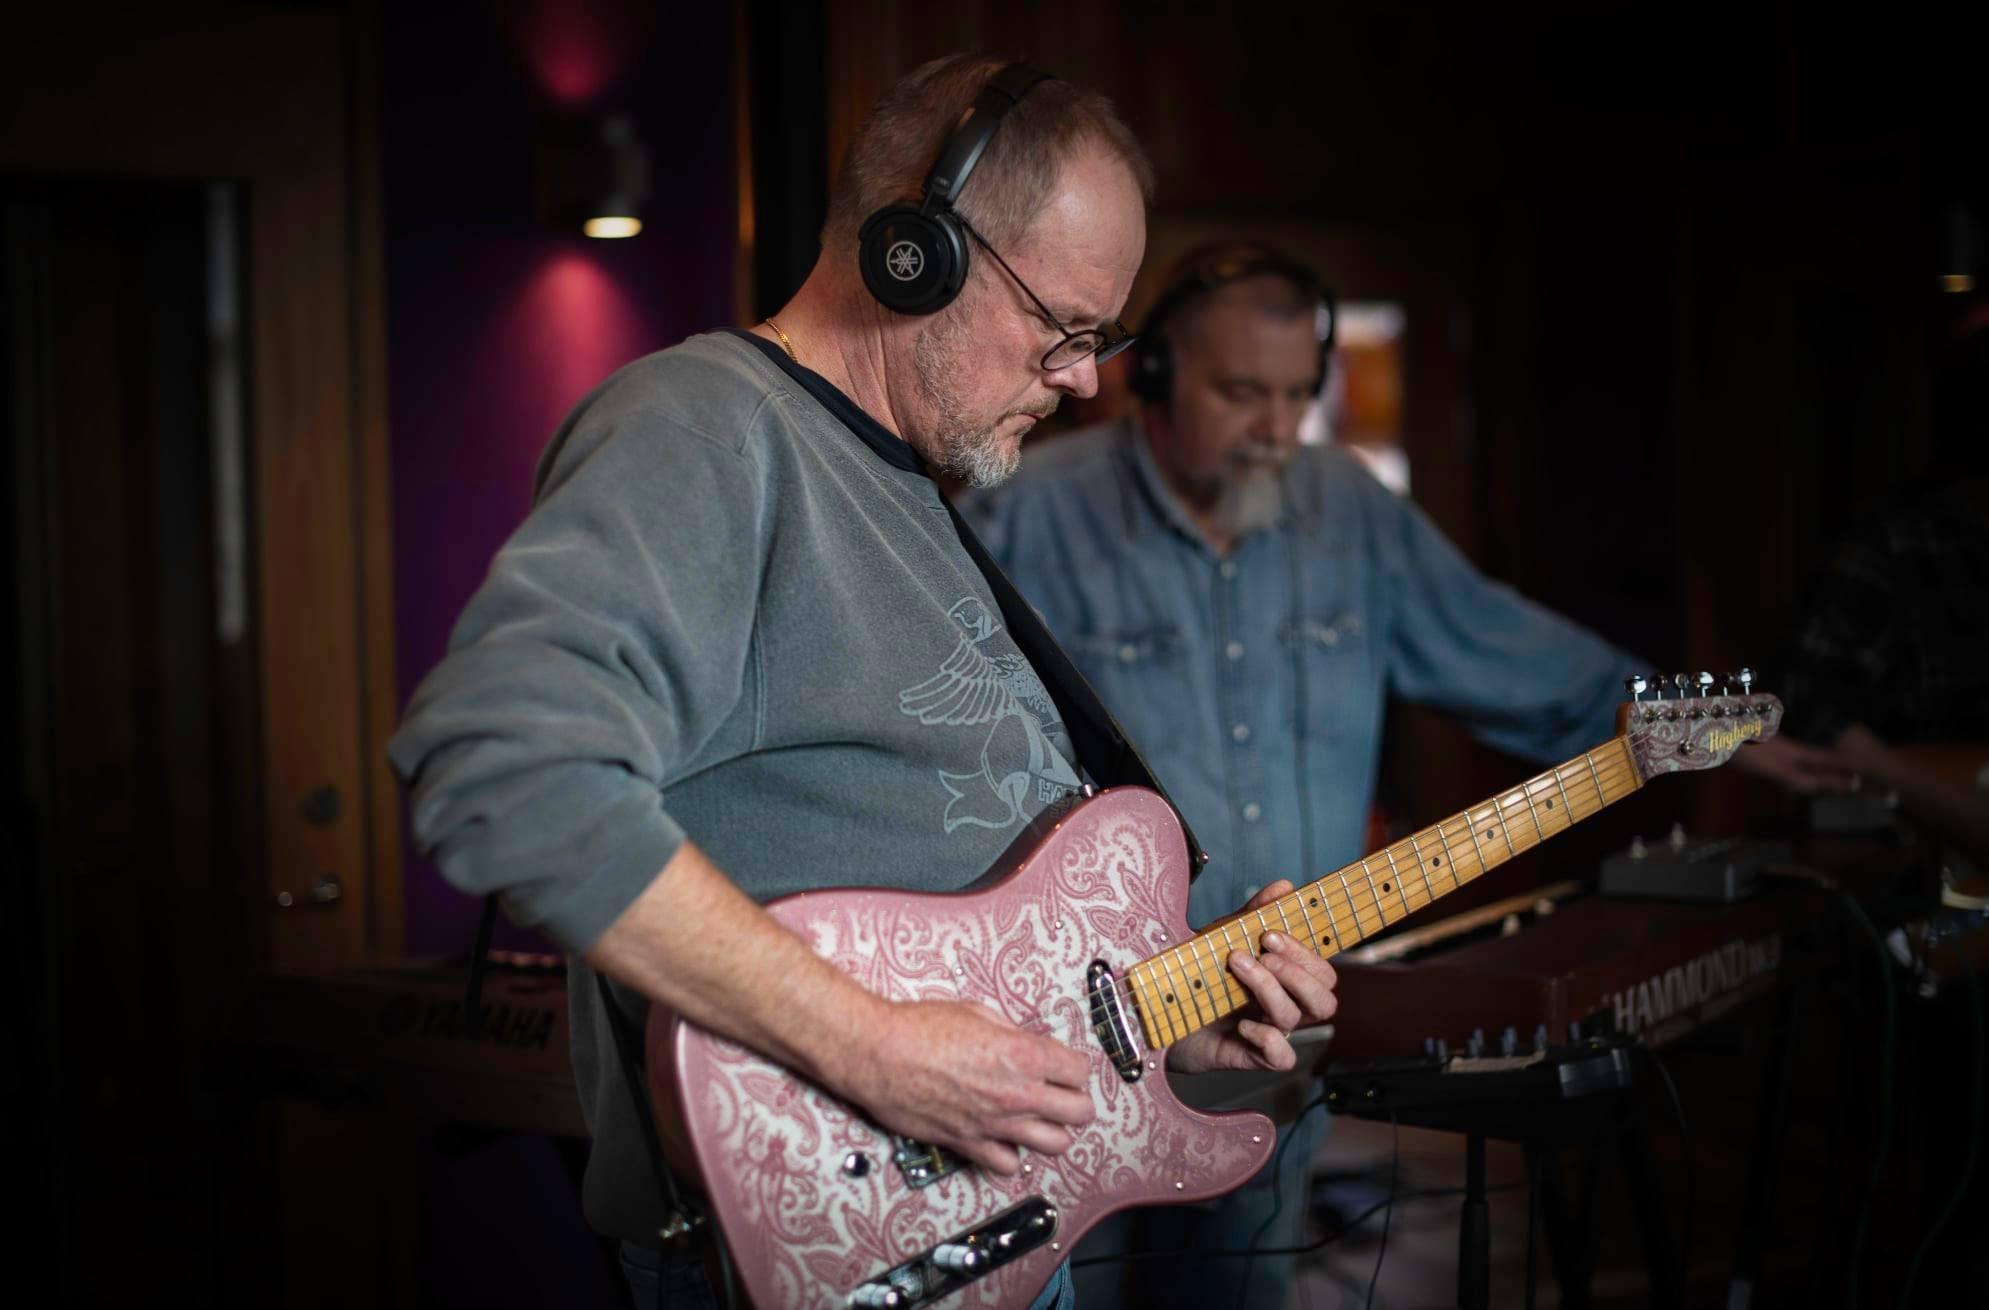 Guitarist Peter Enström records his electric guitar in the studio